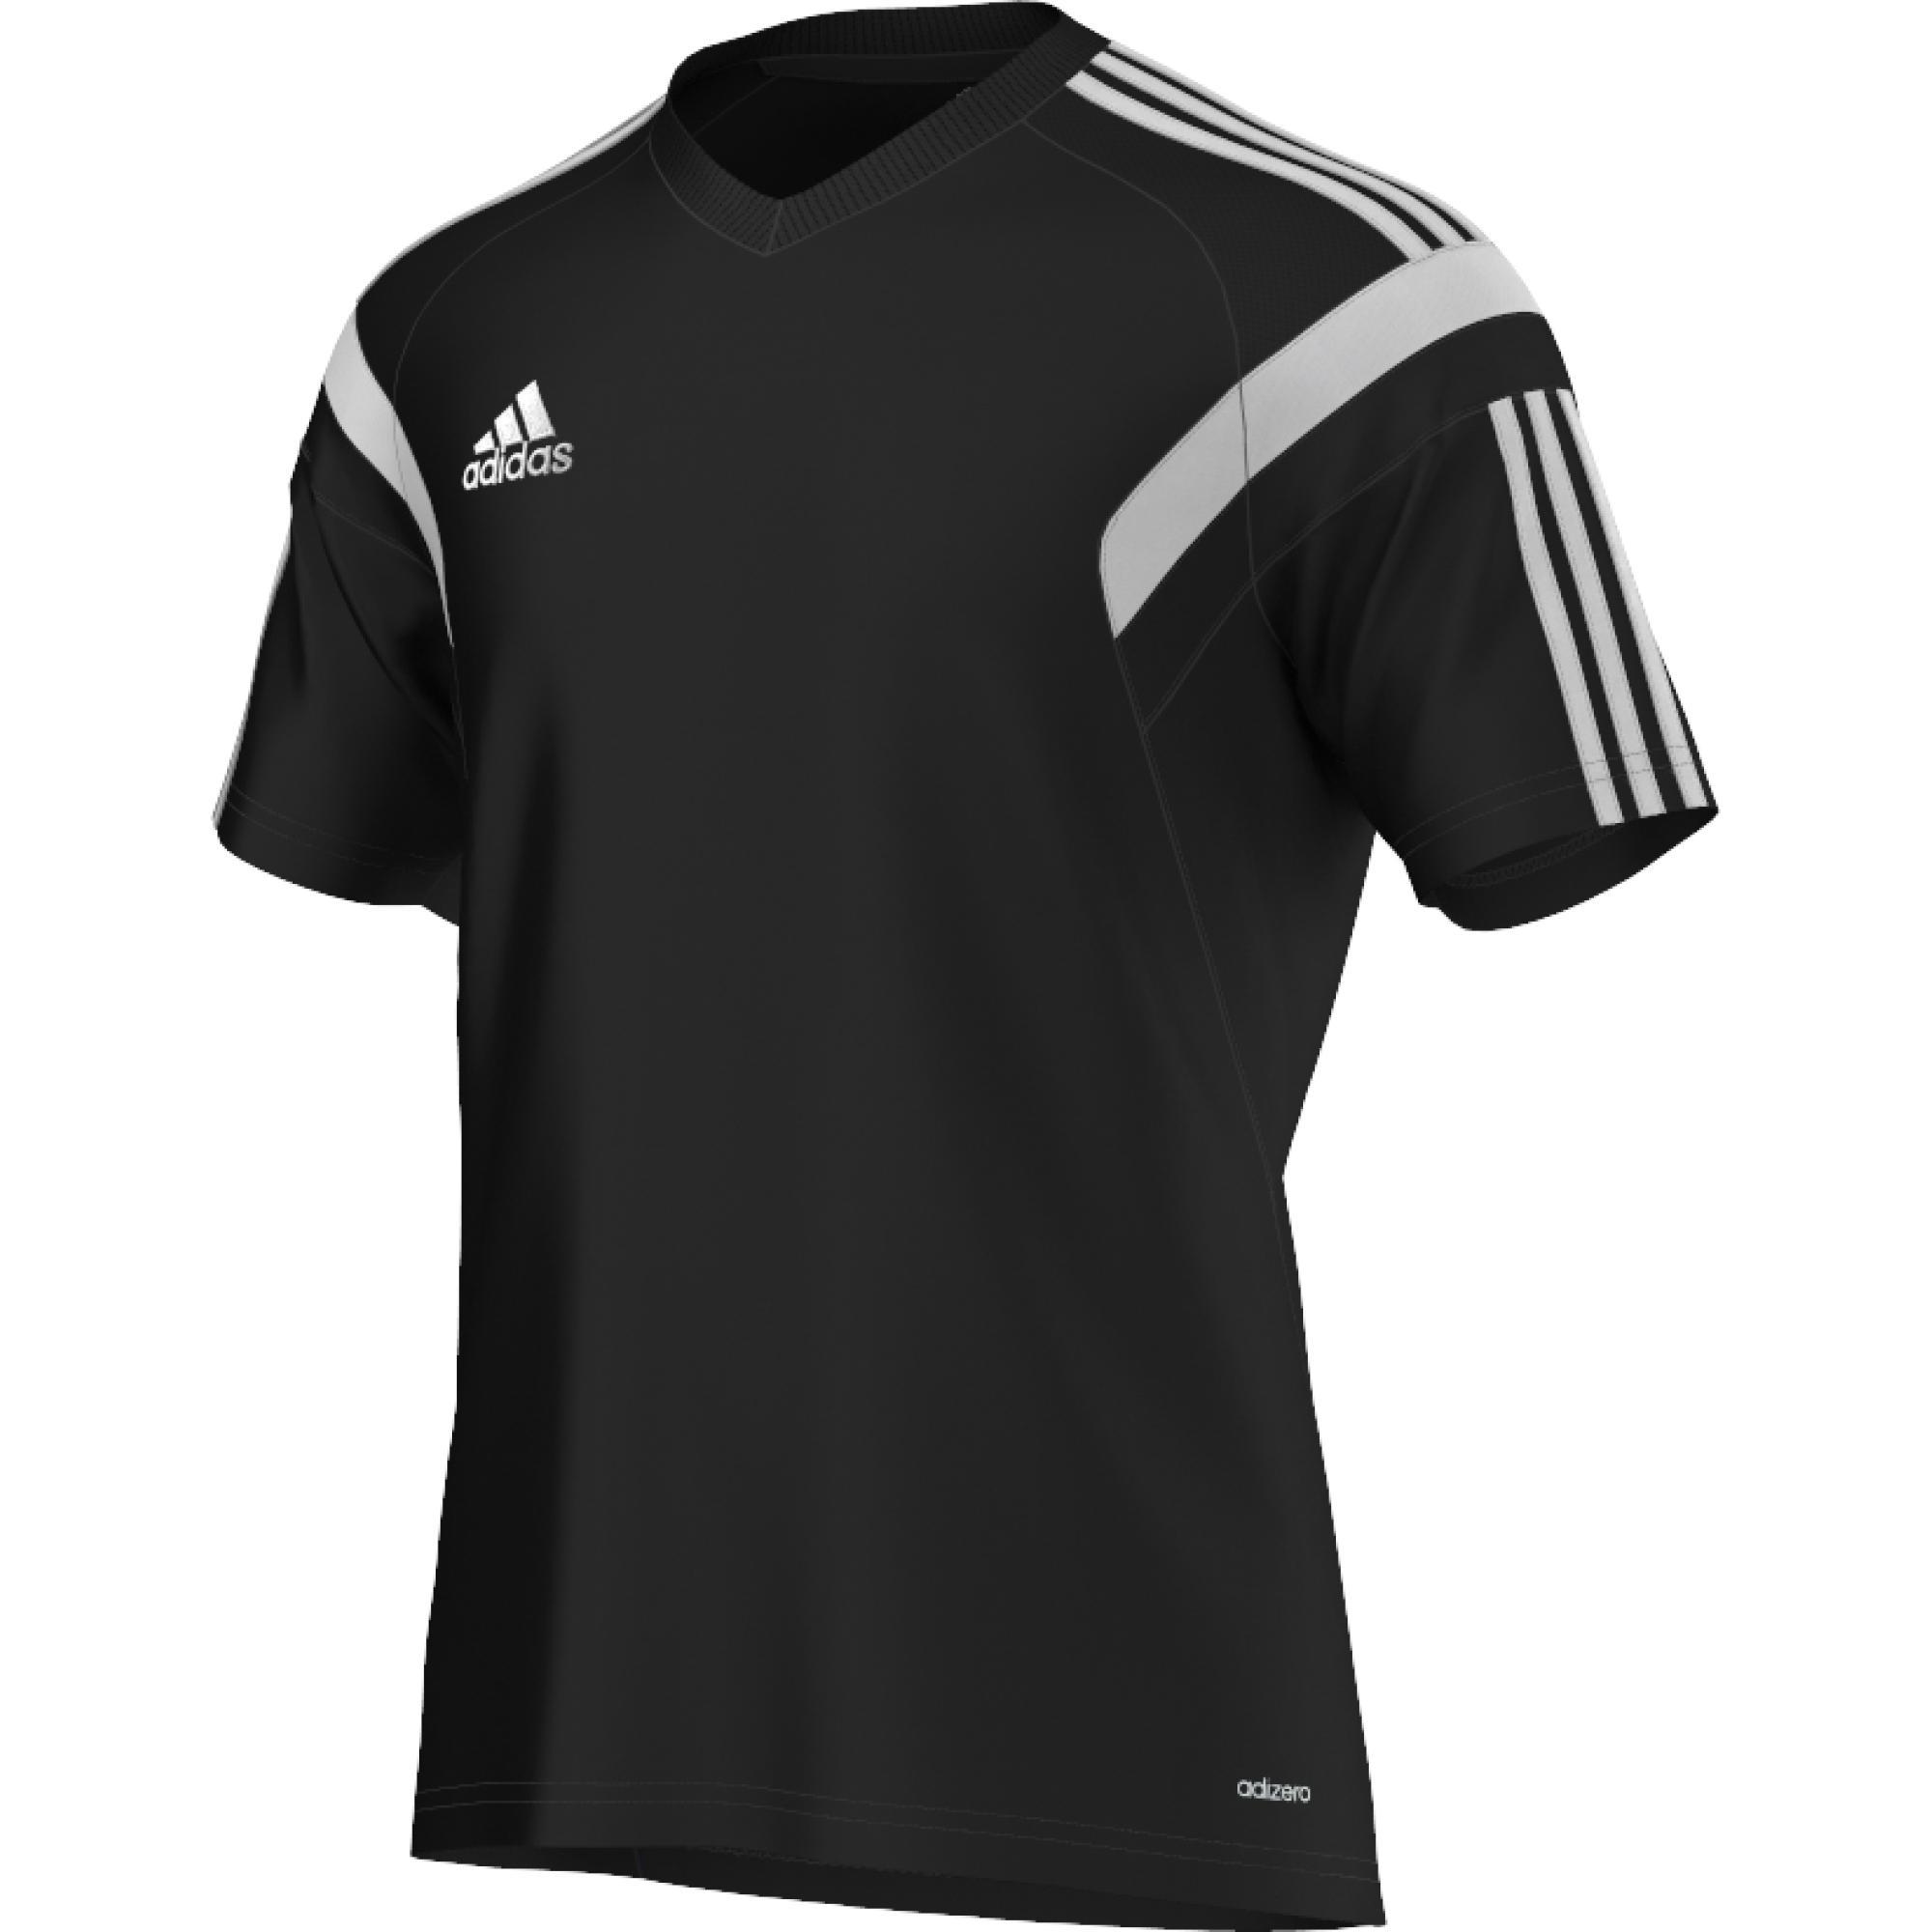 ADIDAS tréninkové triko Condivo 14